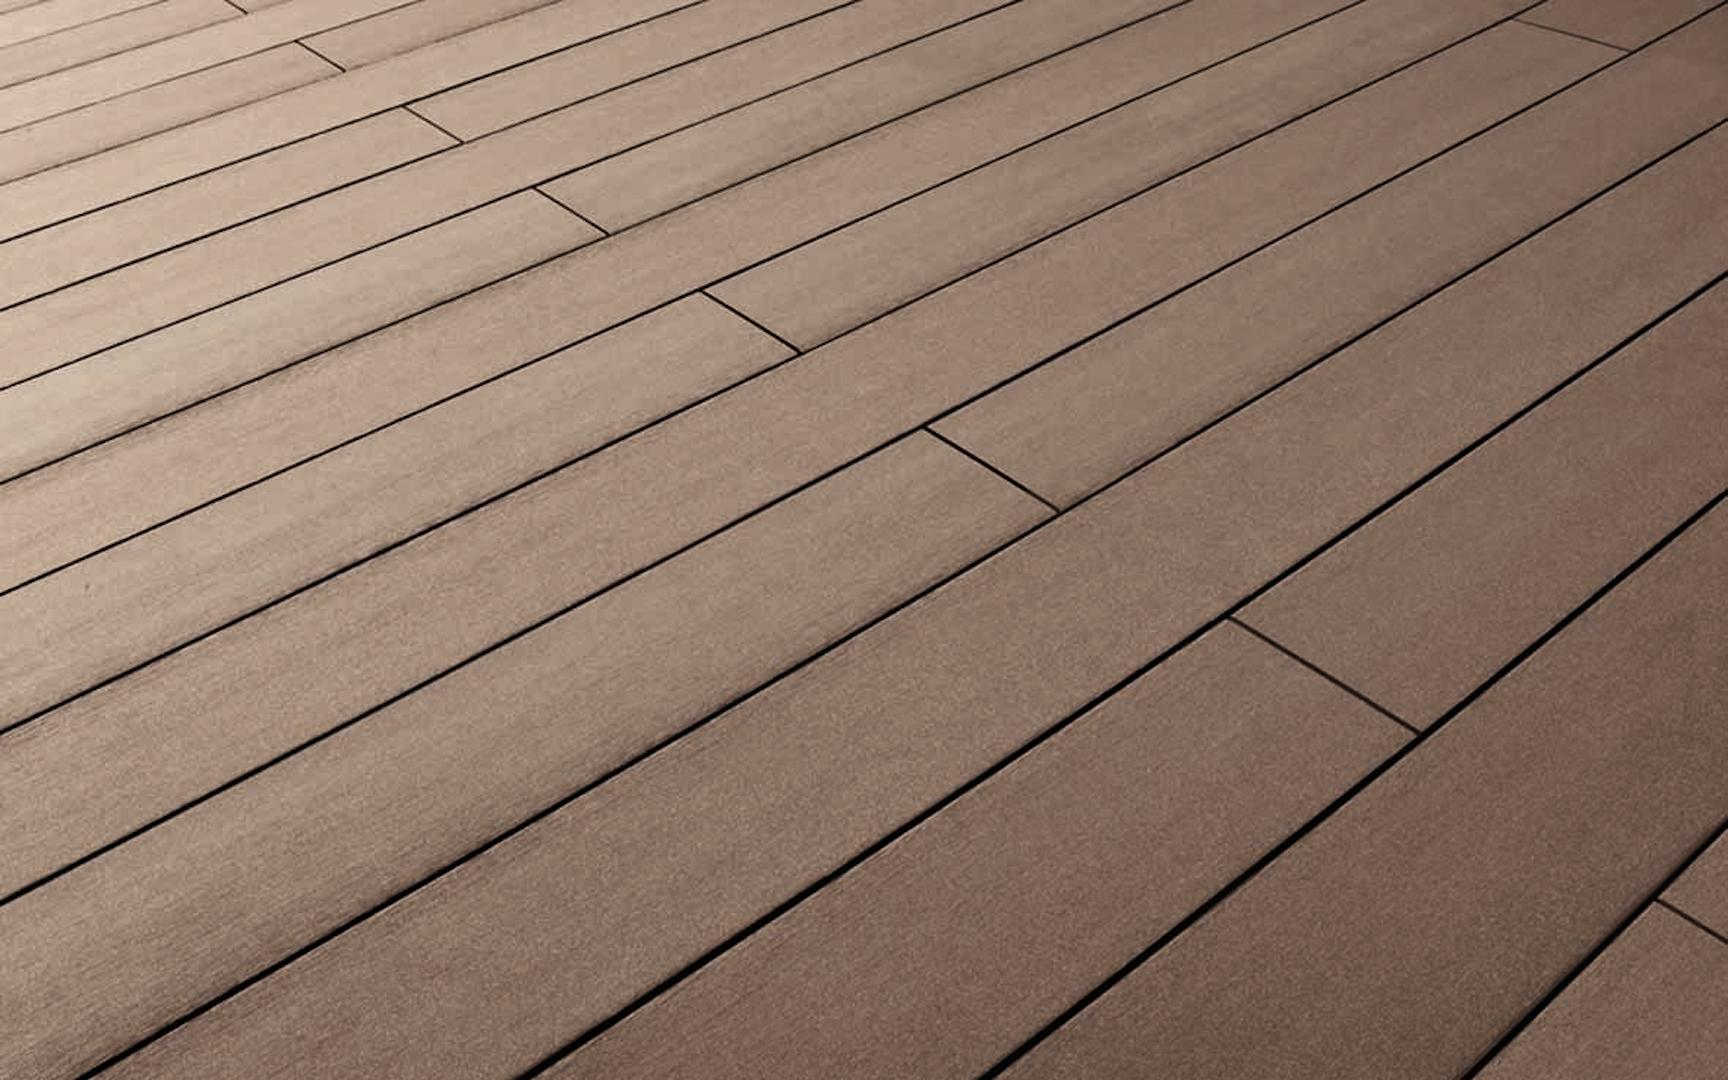 terrafina-composite-decking-plain-coffeebrown-surface-finish